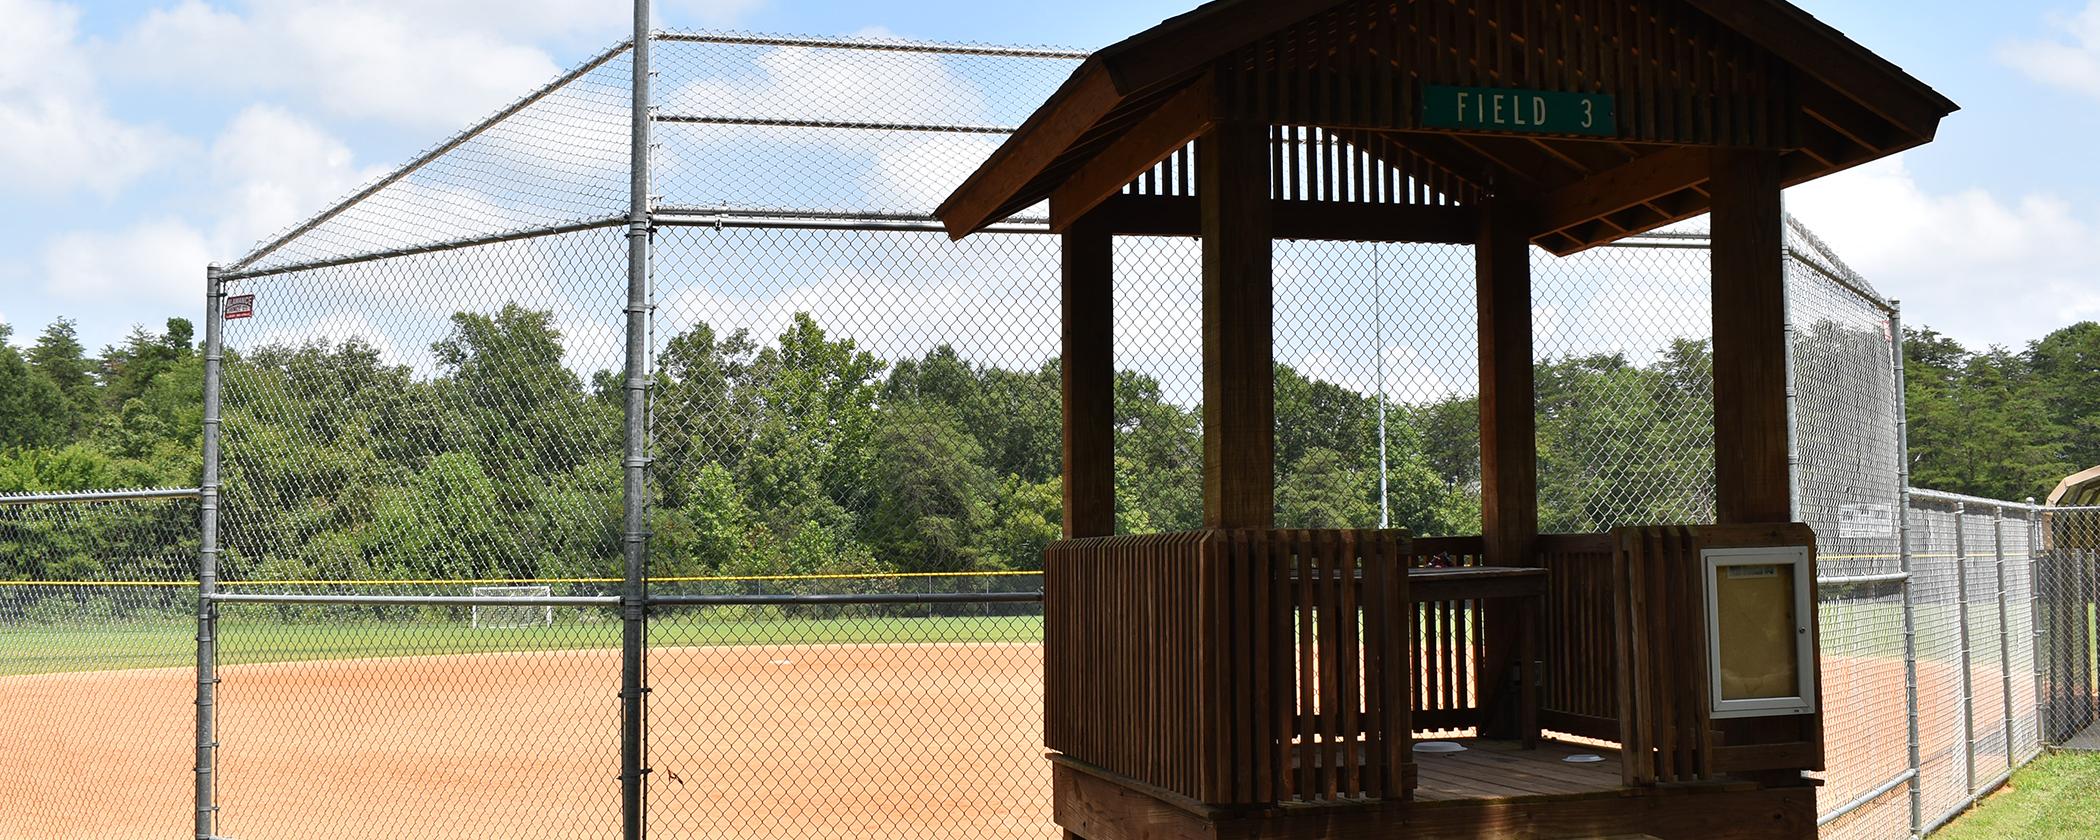 Three Lighted Baseball Fields